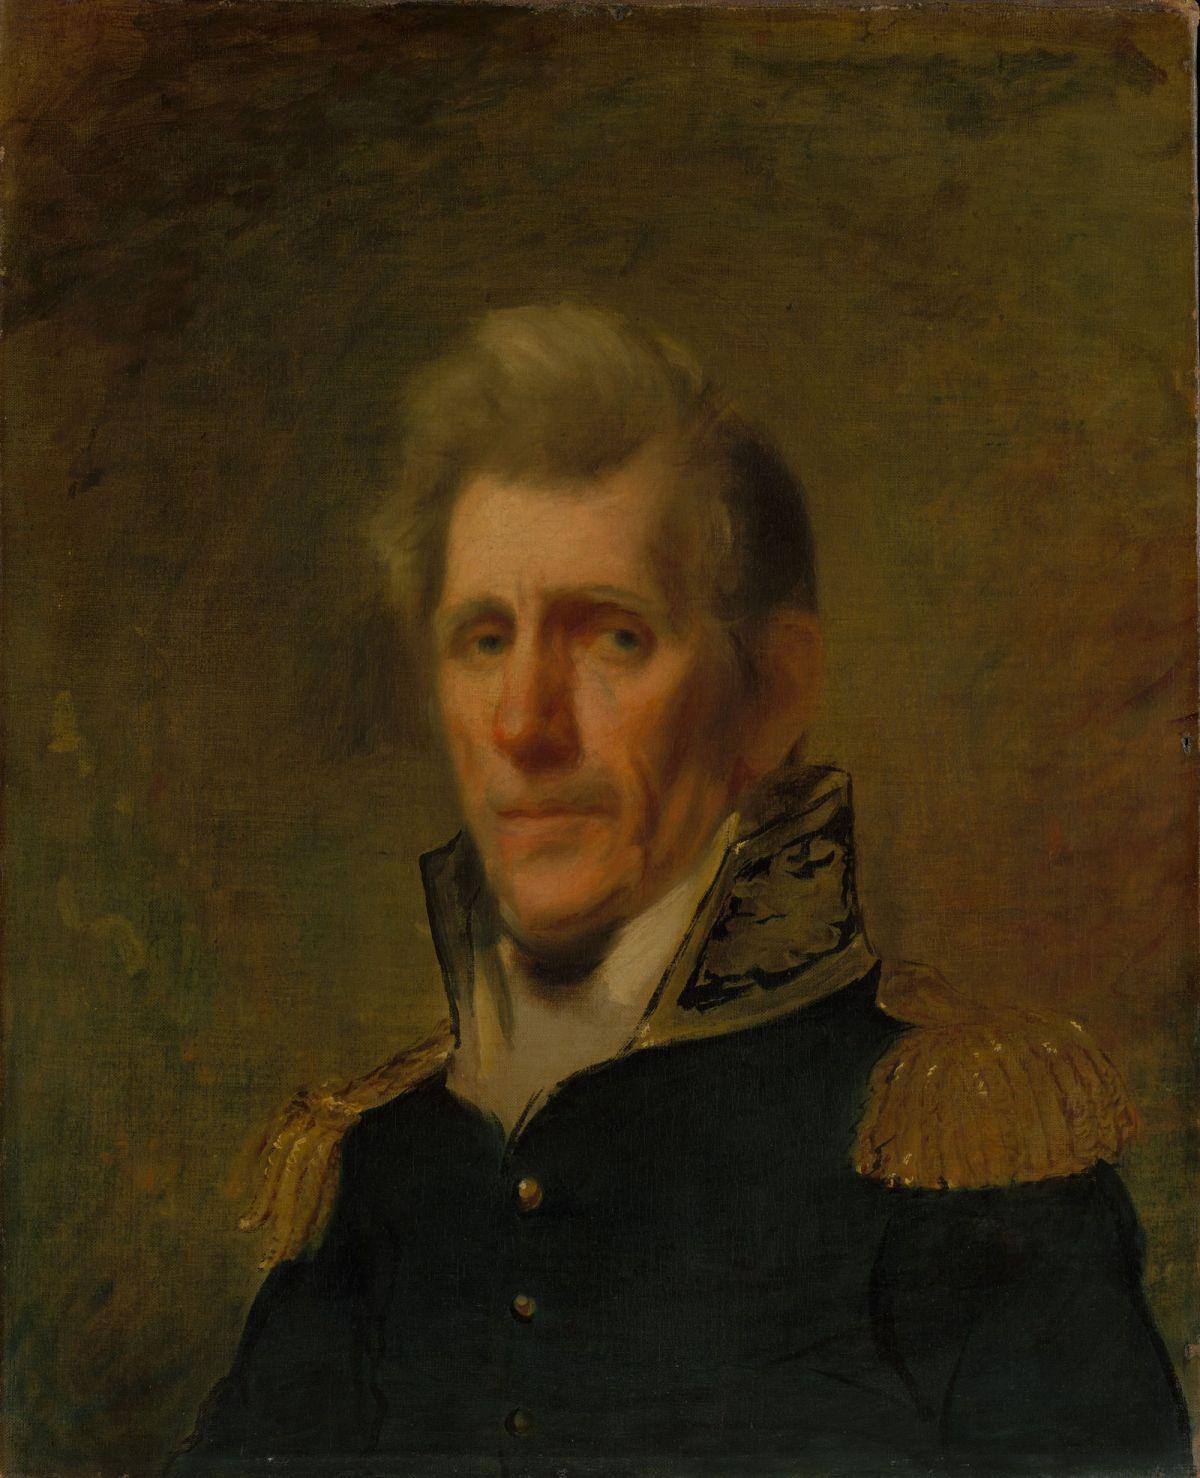 General Andrew Jackson by Samuel Lovett Waldo